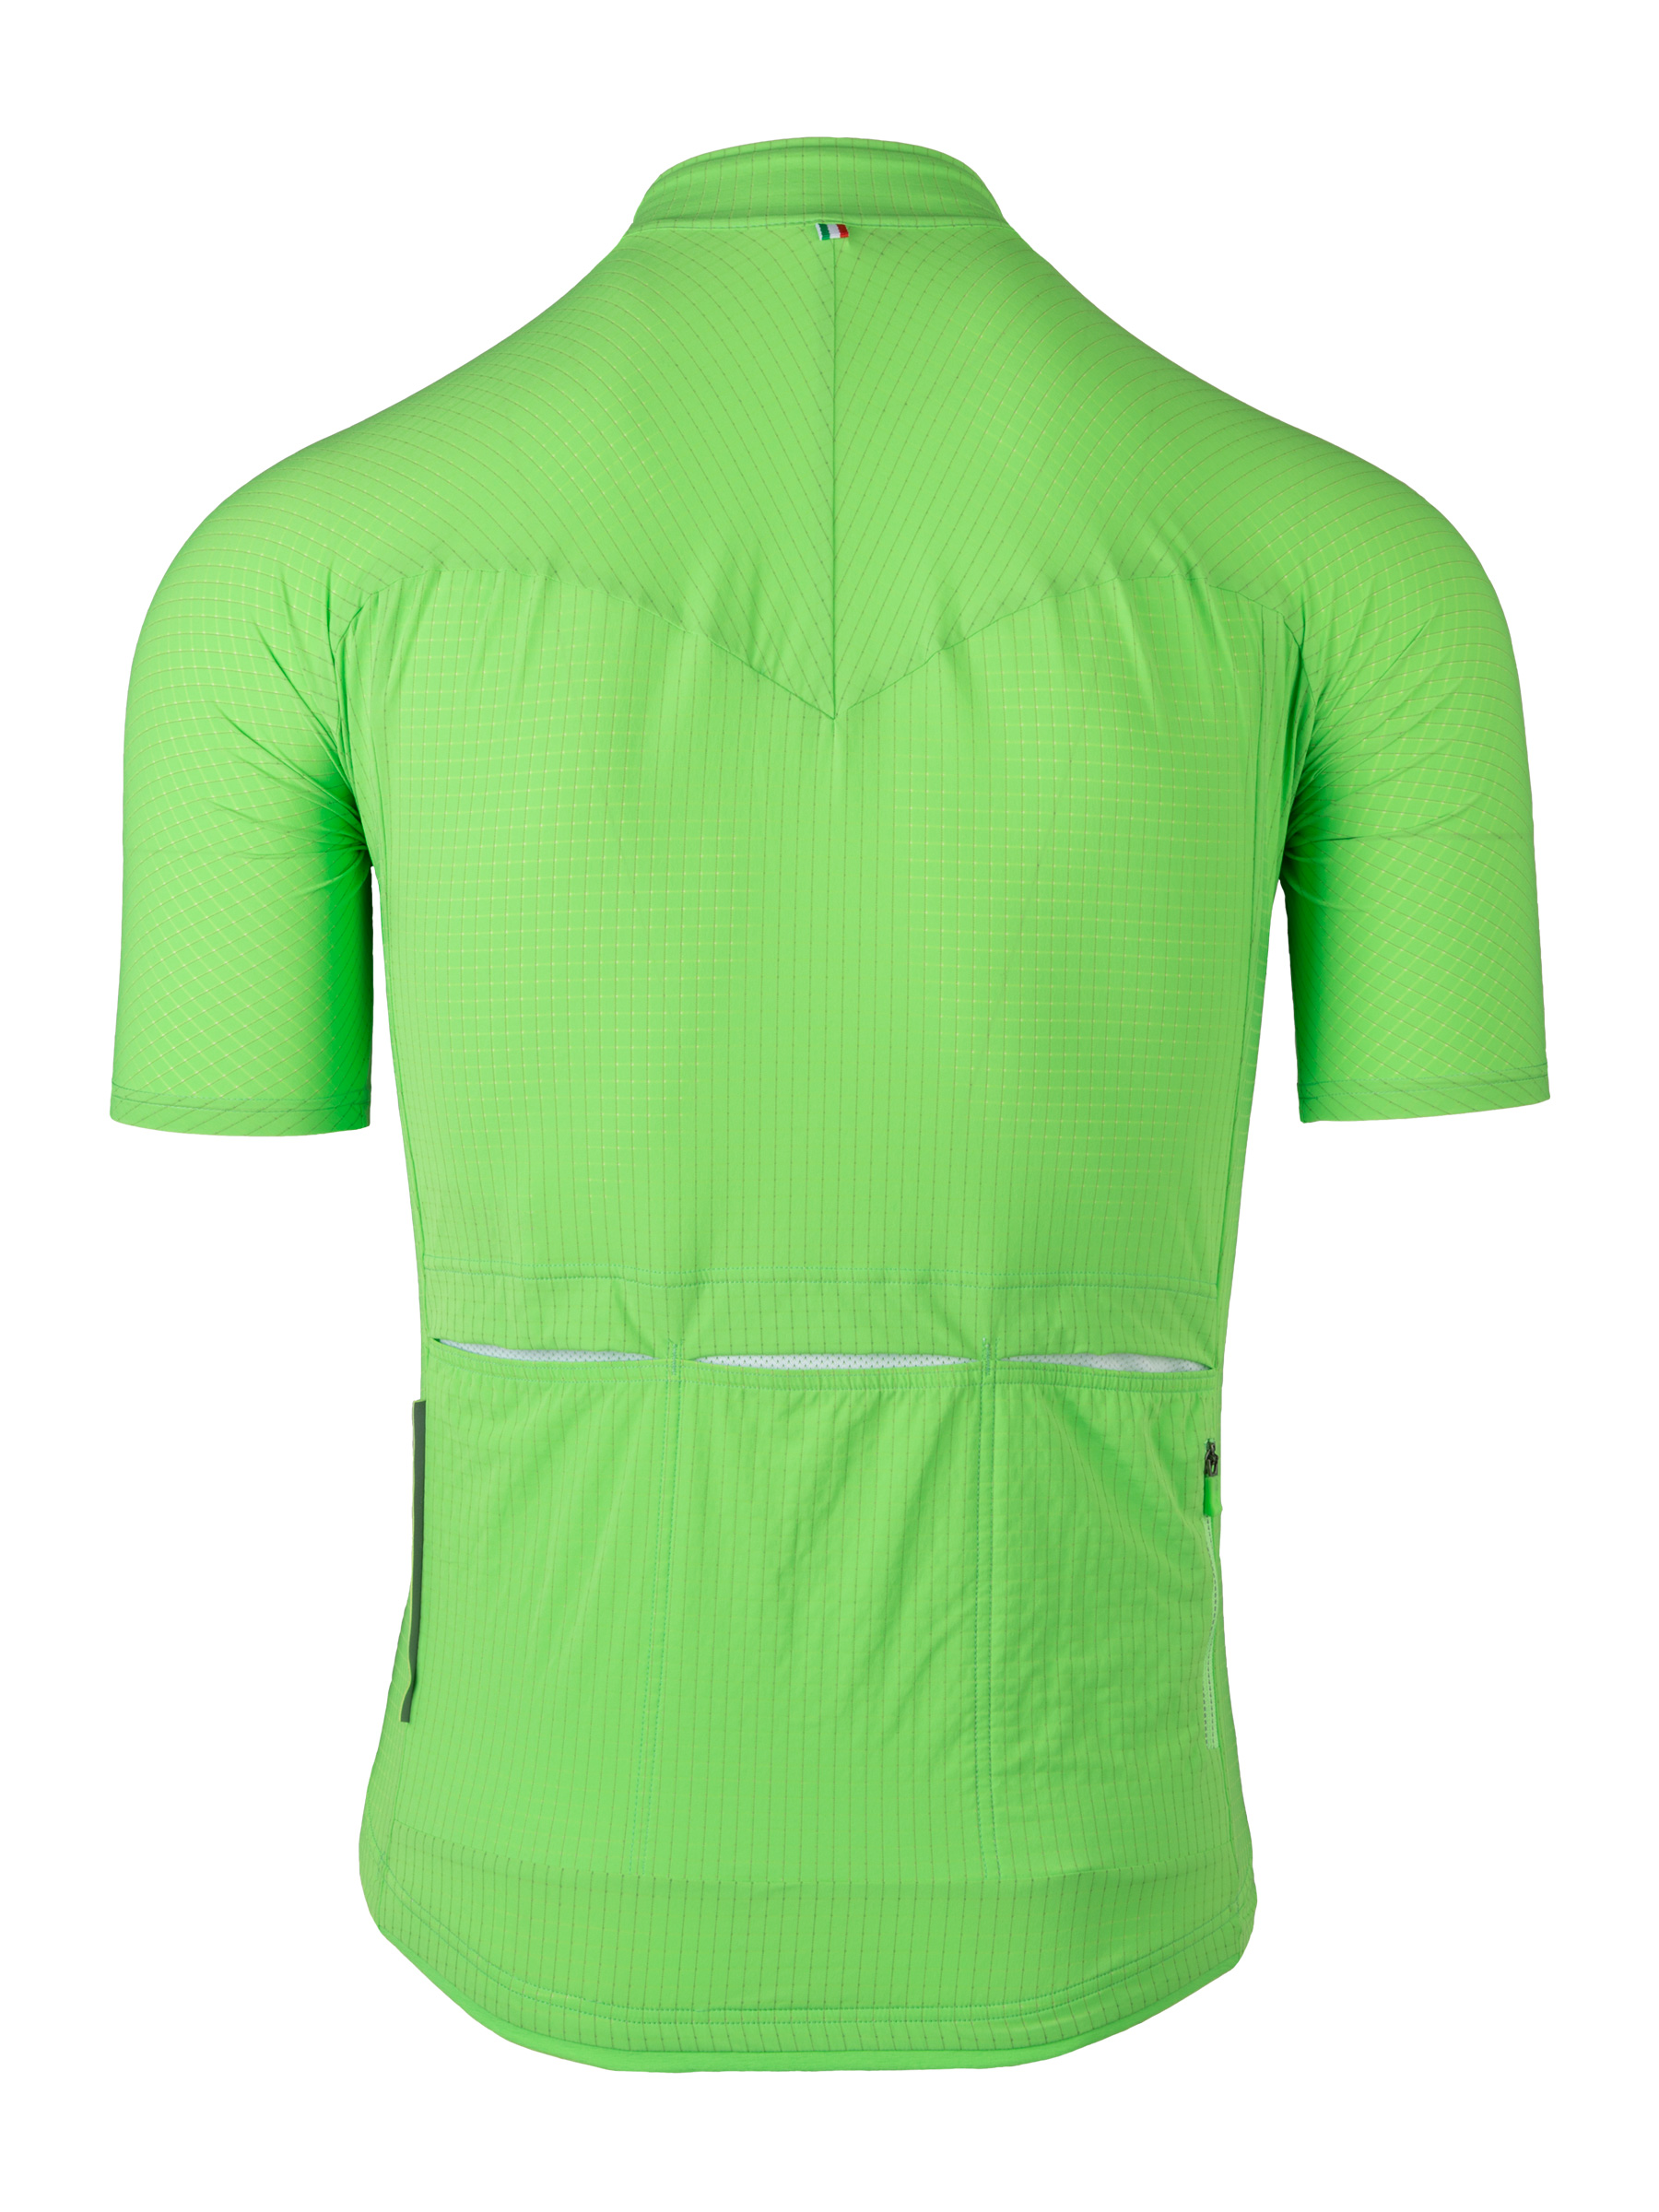 Jersey short sleeve L1 Pinstripe